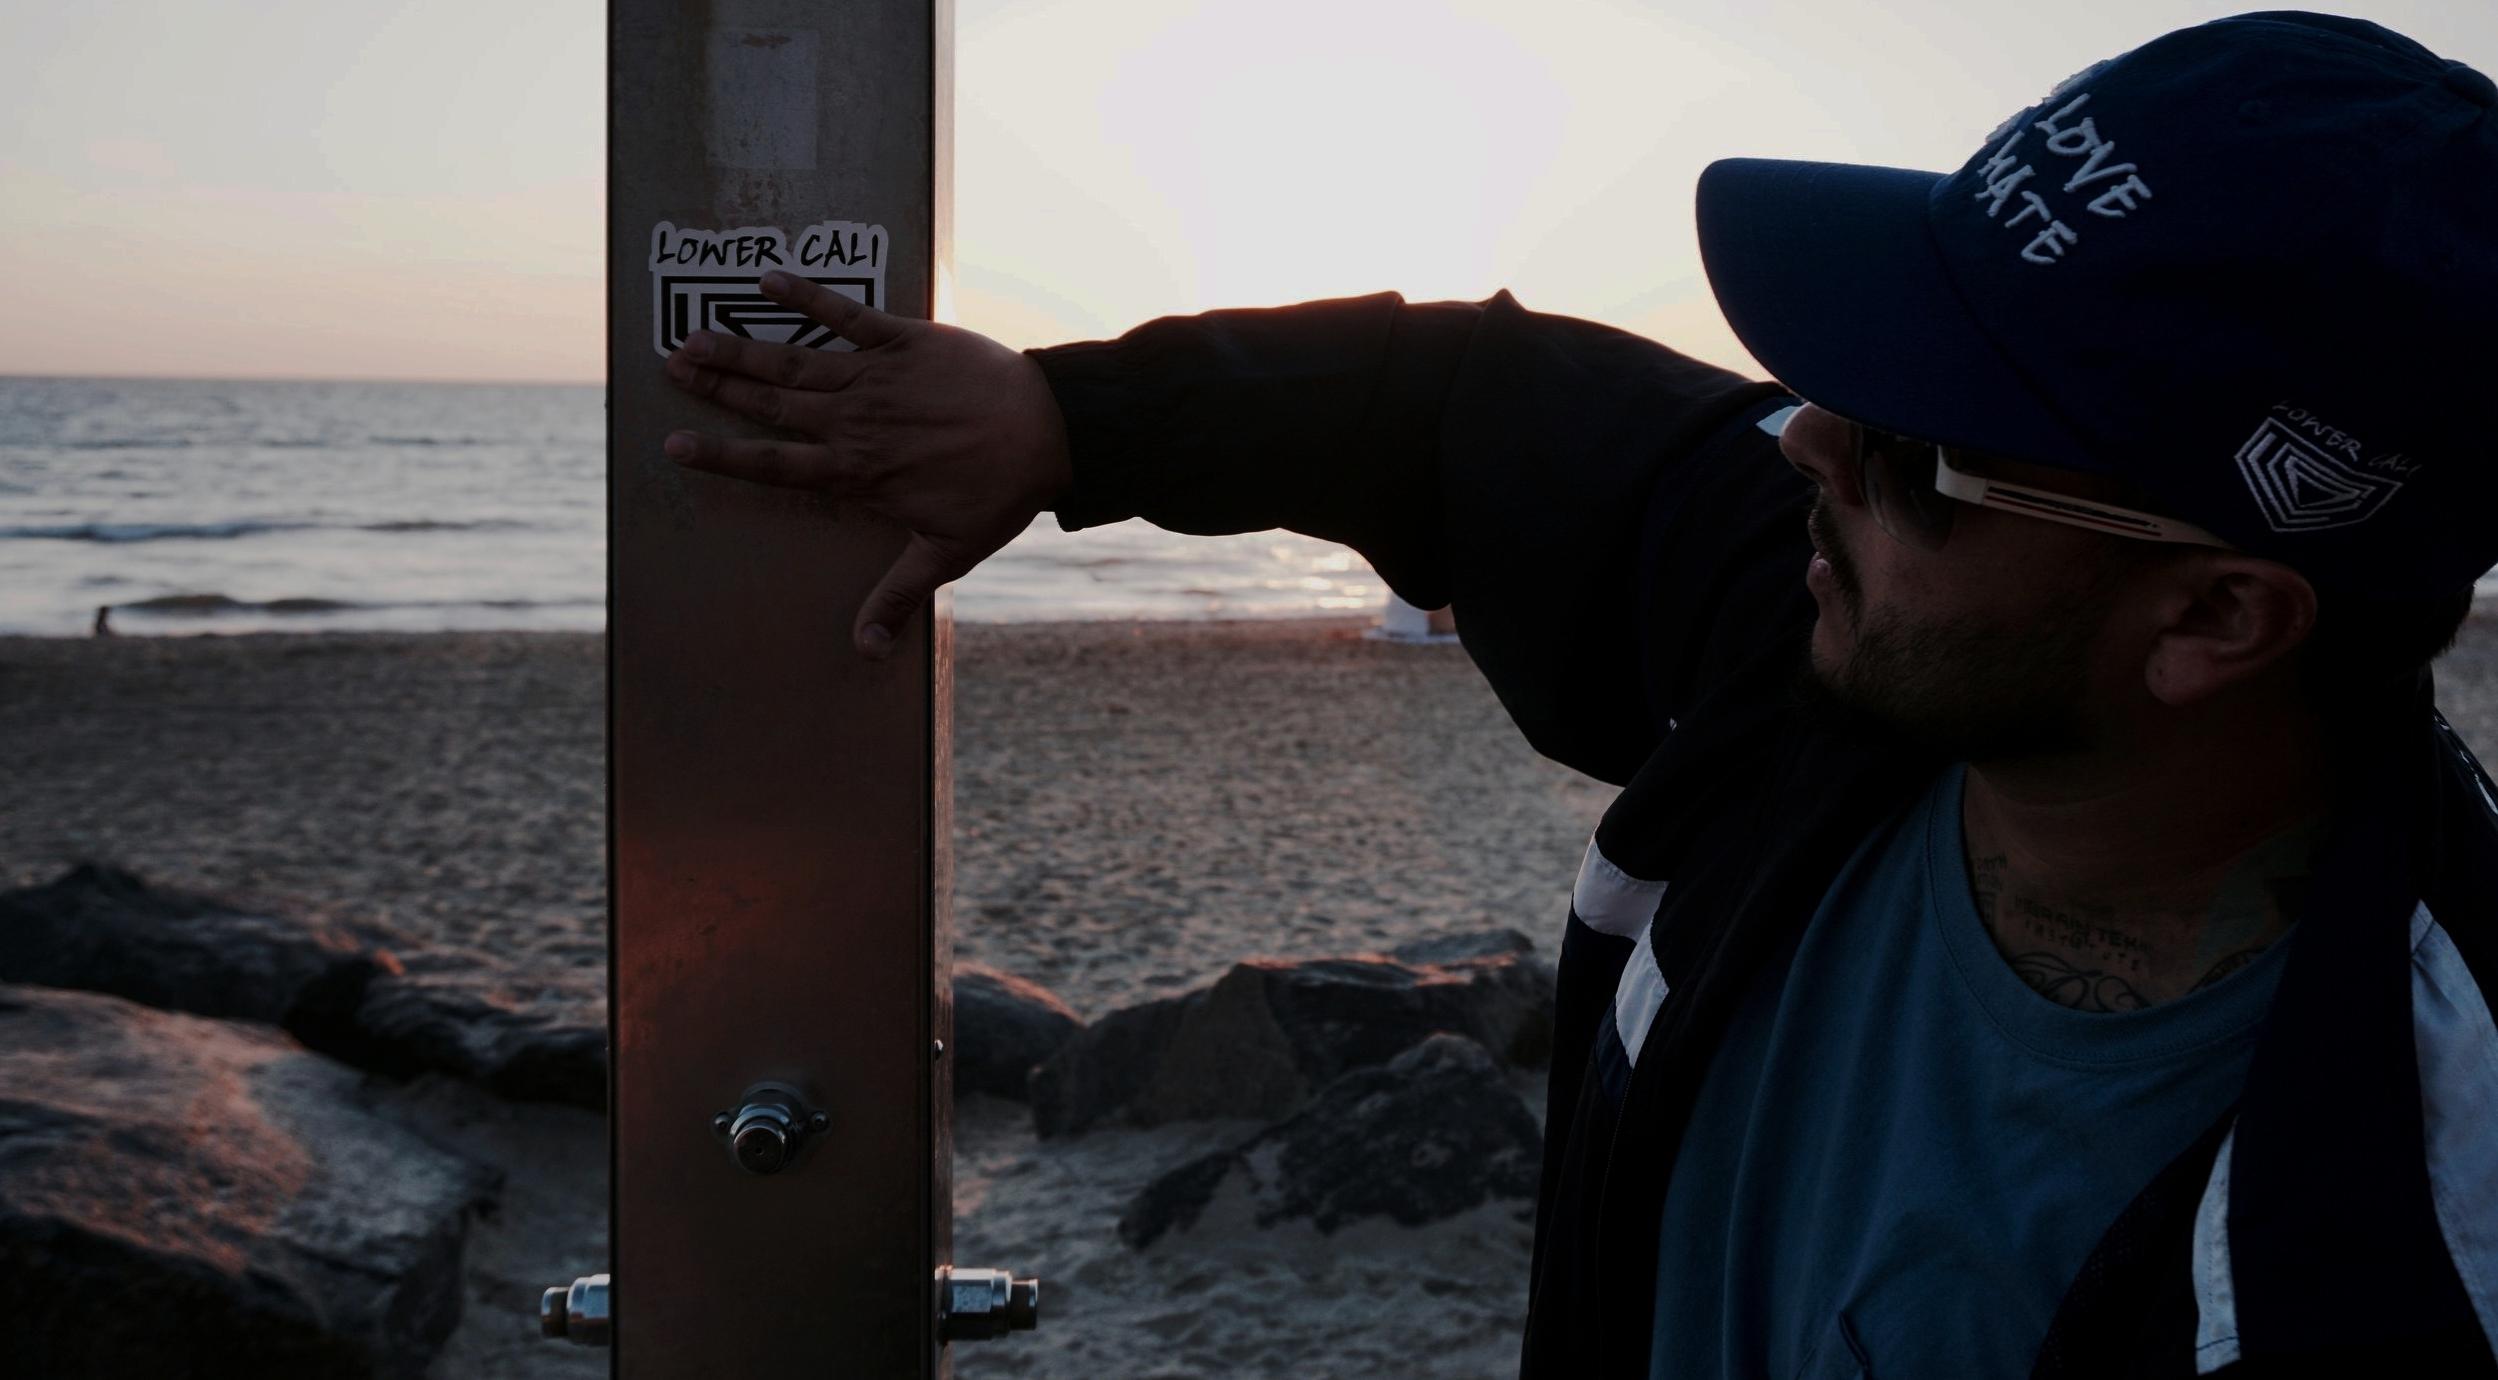 LowerCali Movement - California